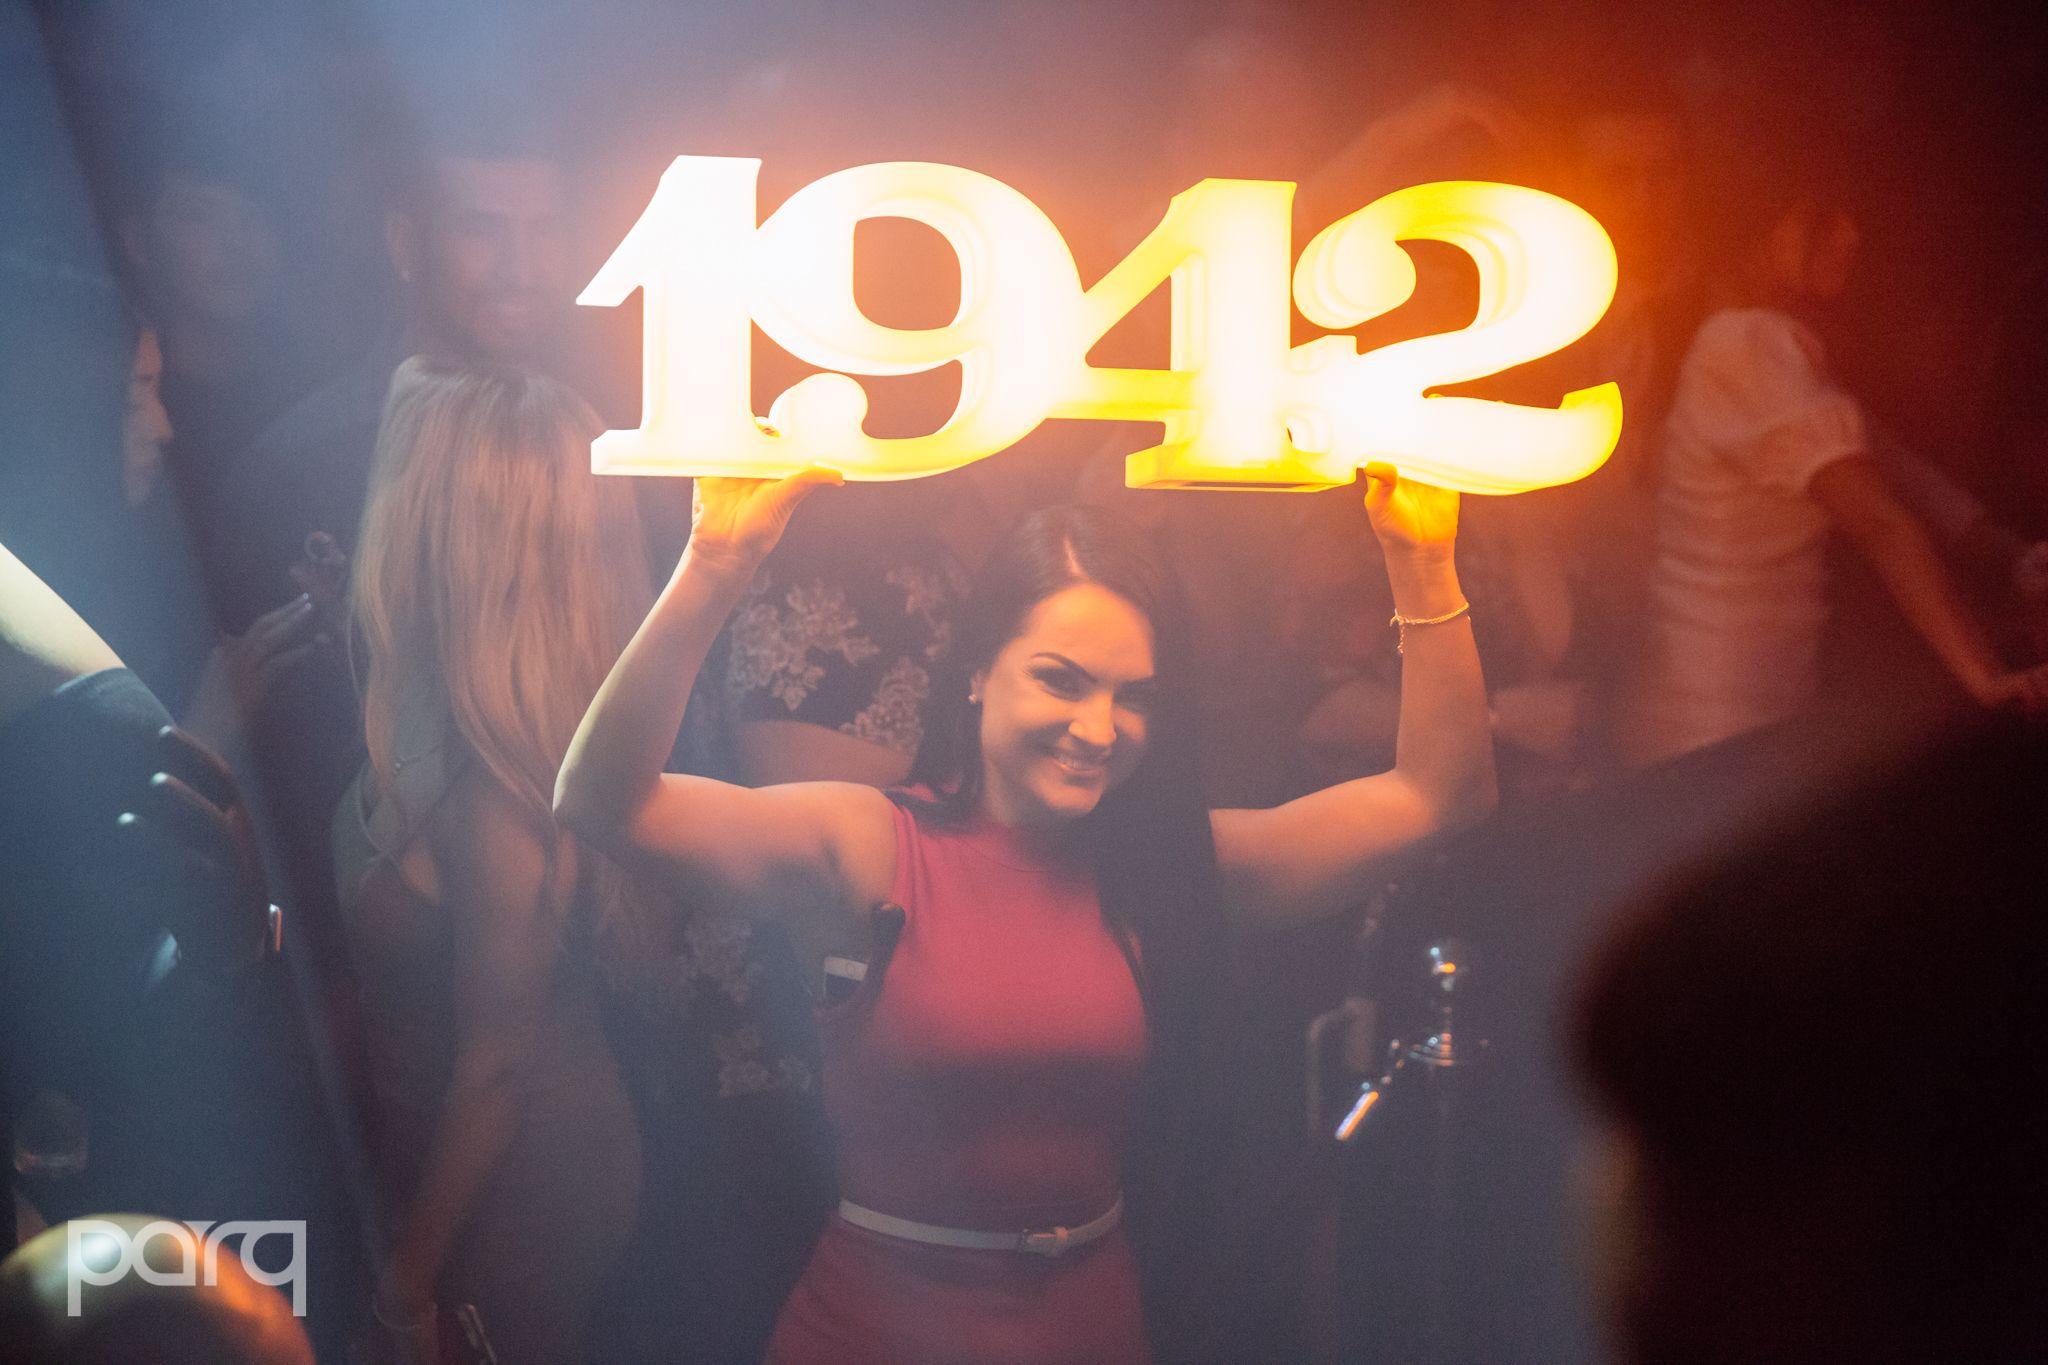 09.27.18 Parq - DJ Khaled-8.jpg